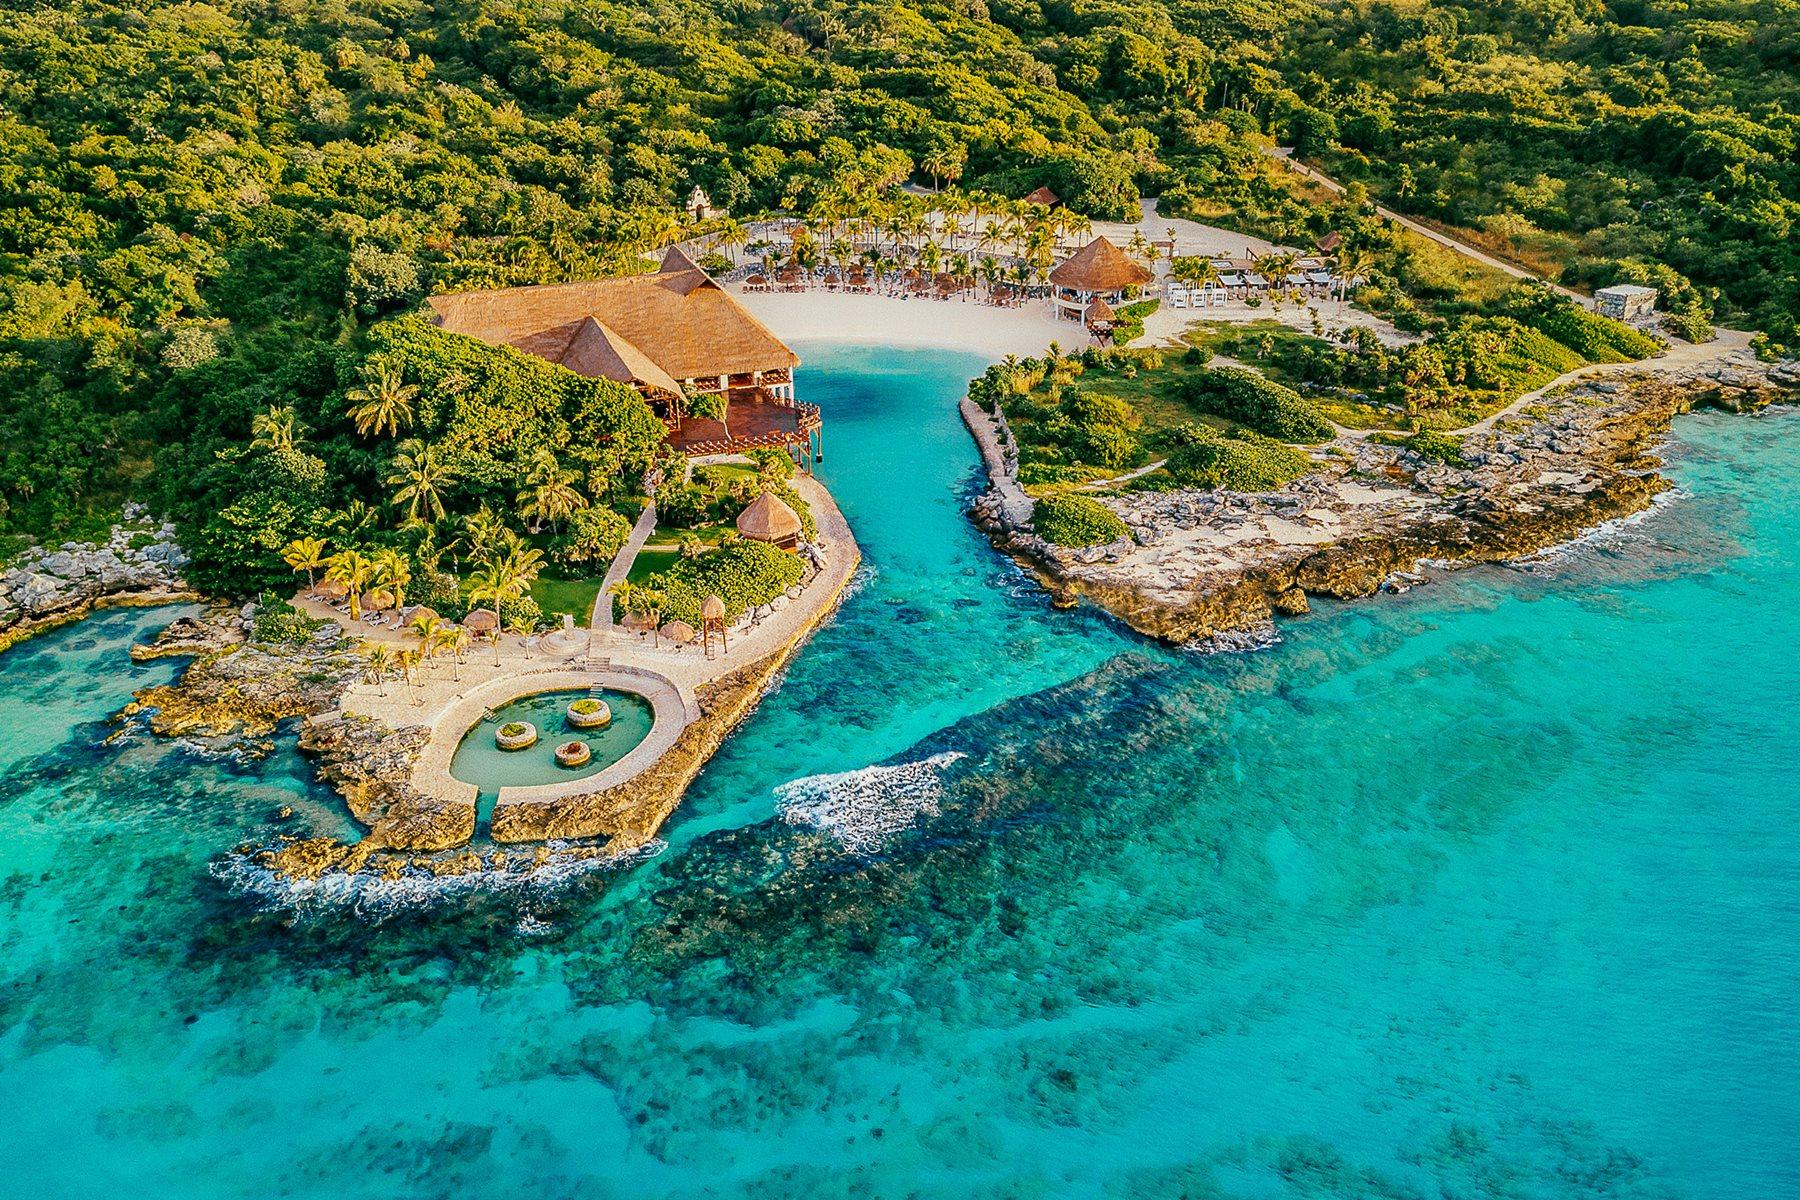 RIV-Occidental-Xcaret-Hotel-Aerial-002.jpeg